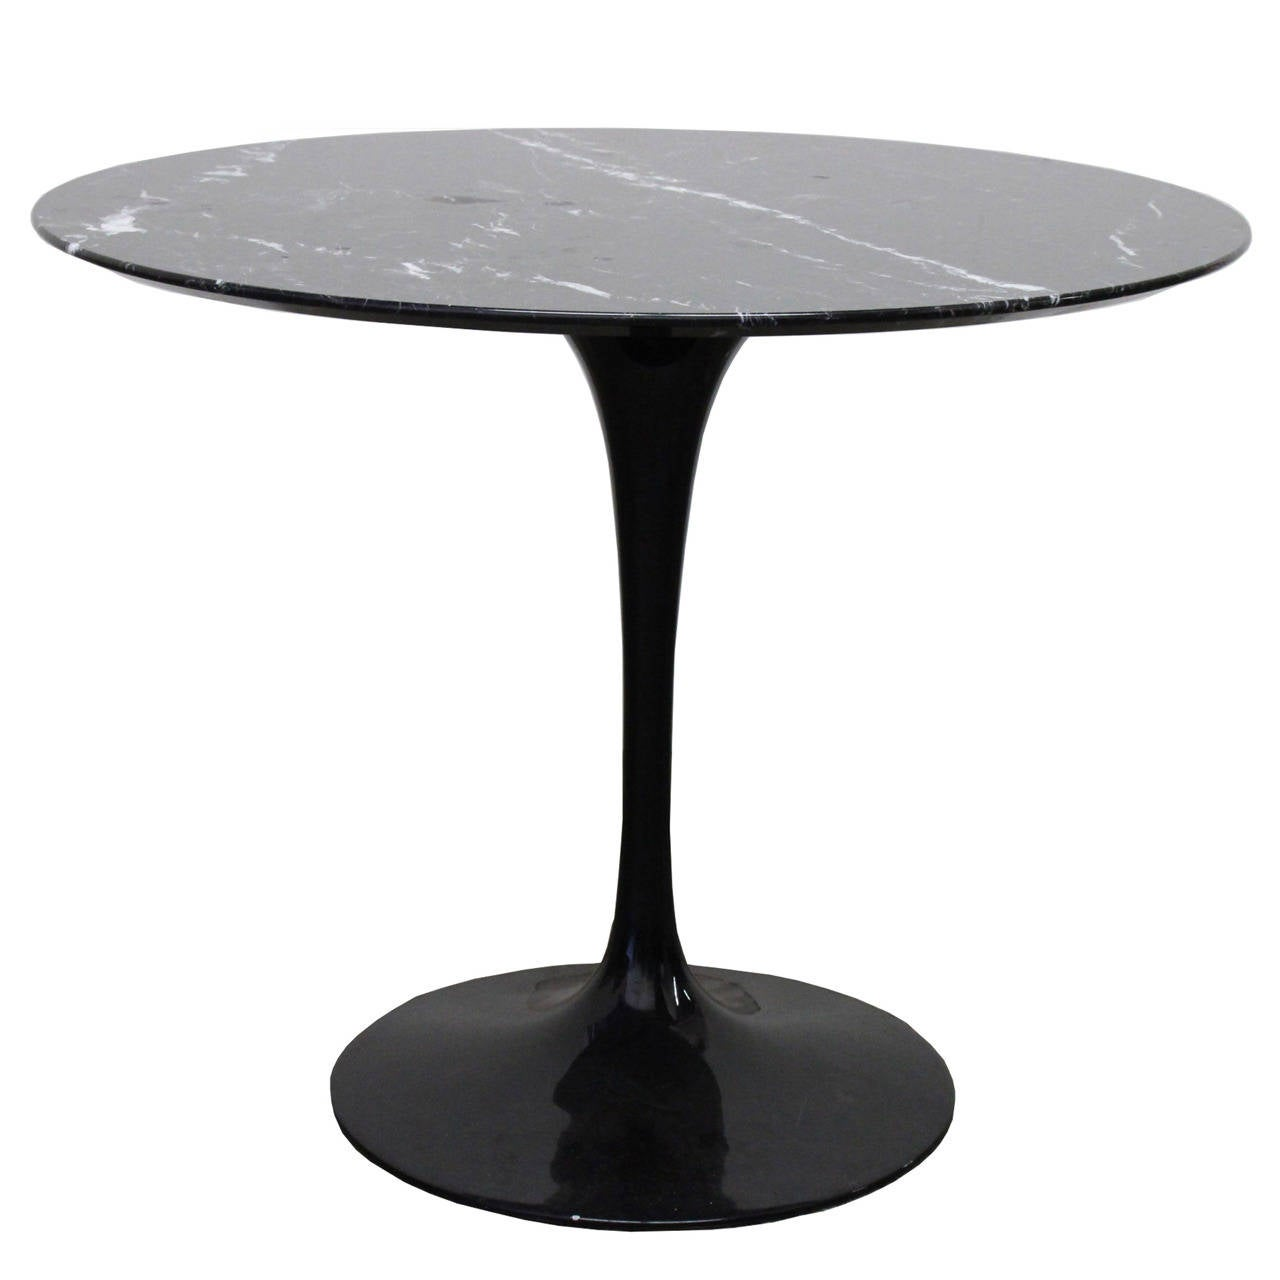 Black Marble Tulip Table By Saarinen At 1stdibs